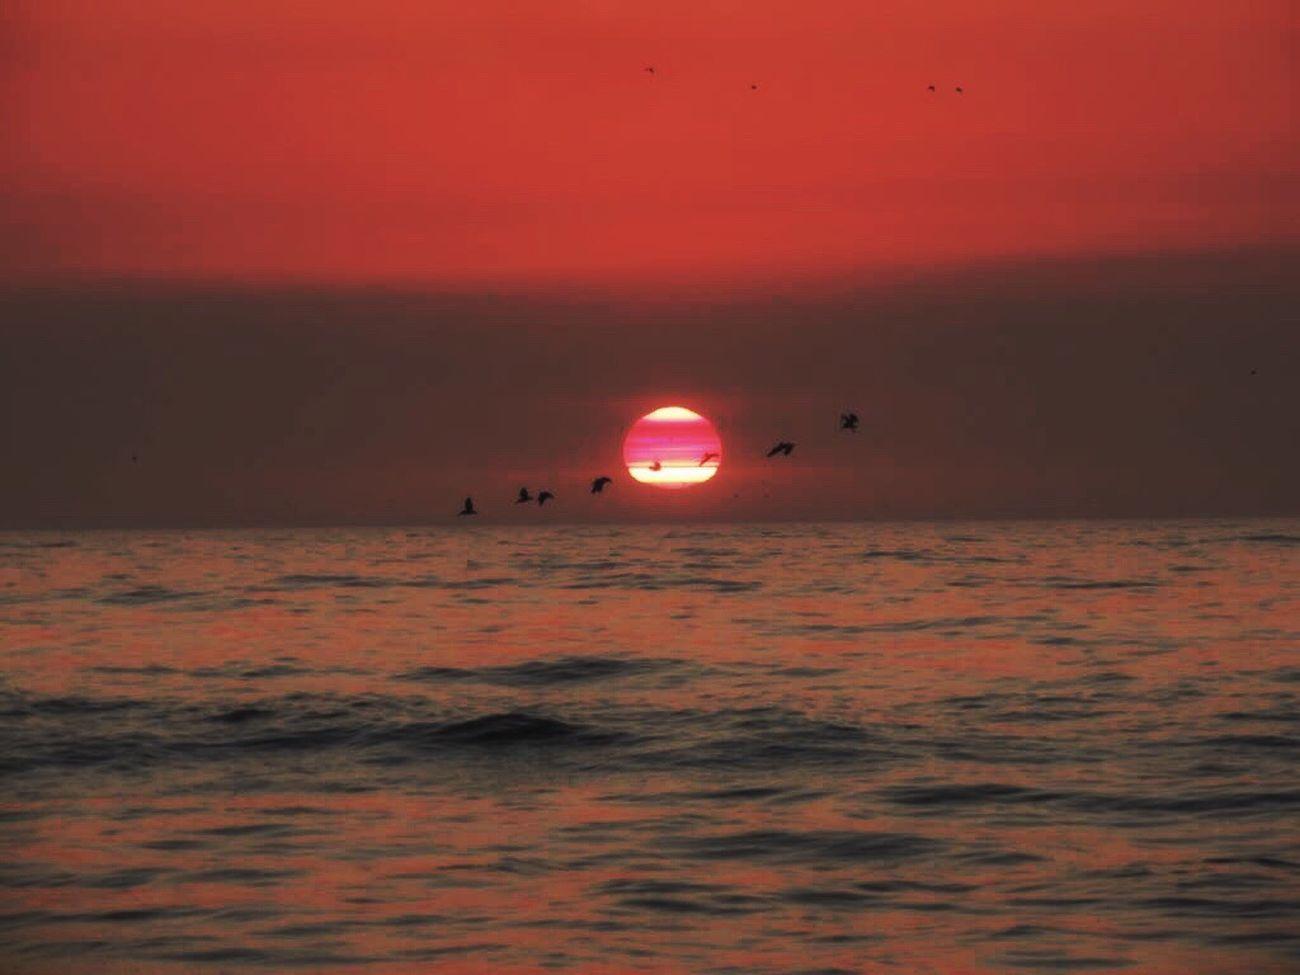 Sunset Today Amazing Sunset Sunset On The Beach Sunset And Sea Birds Flying At Sunset Sunset Pink Sunset_collection Sunset_captures Sunset Lovers Horizon Over Sea Idyllic Beauty In Nature Reñaca Beach , Chile